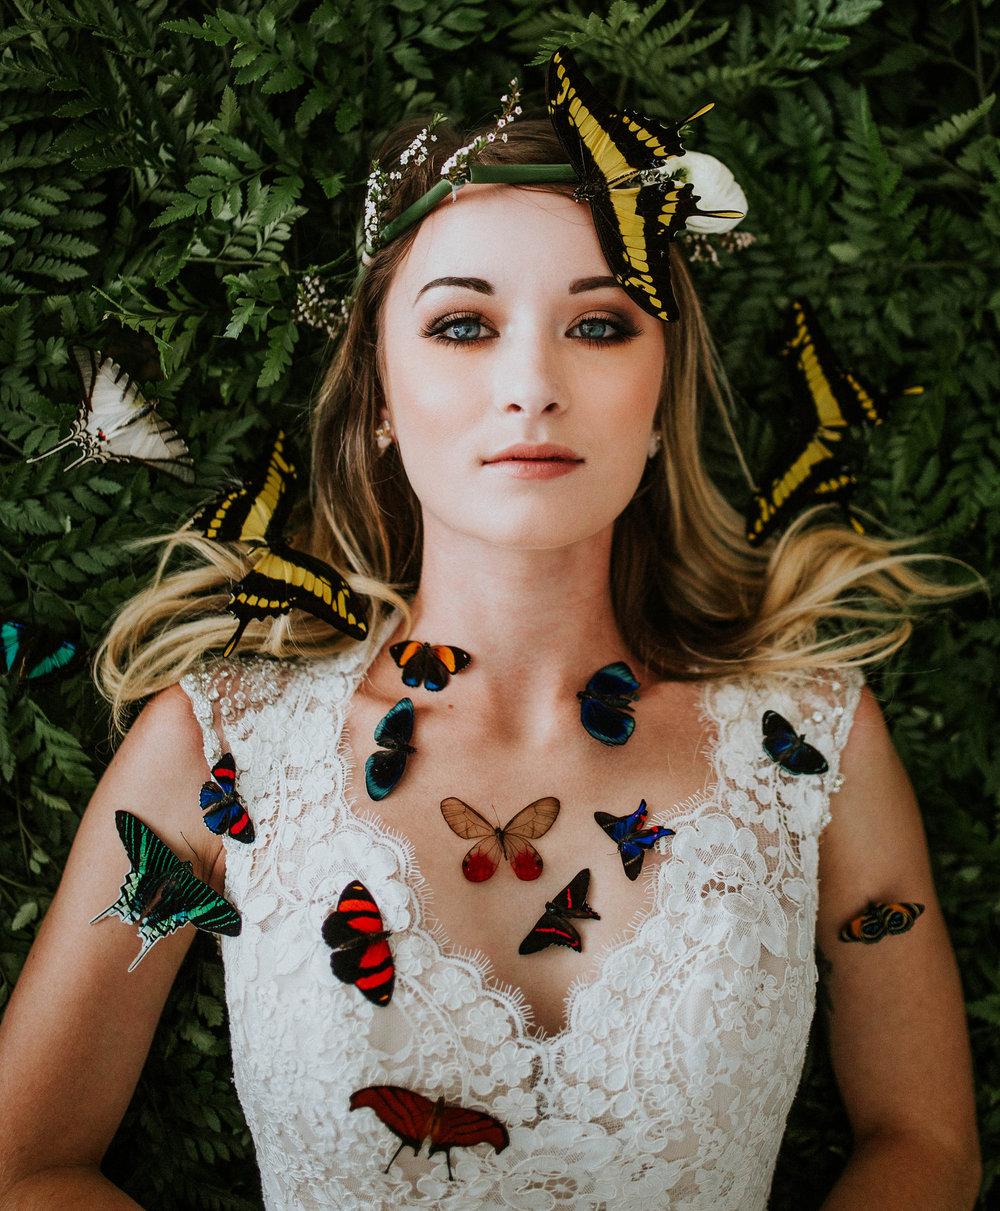 Nadine Berns - LXC 04